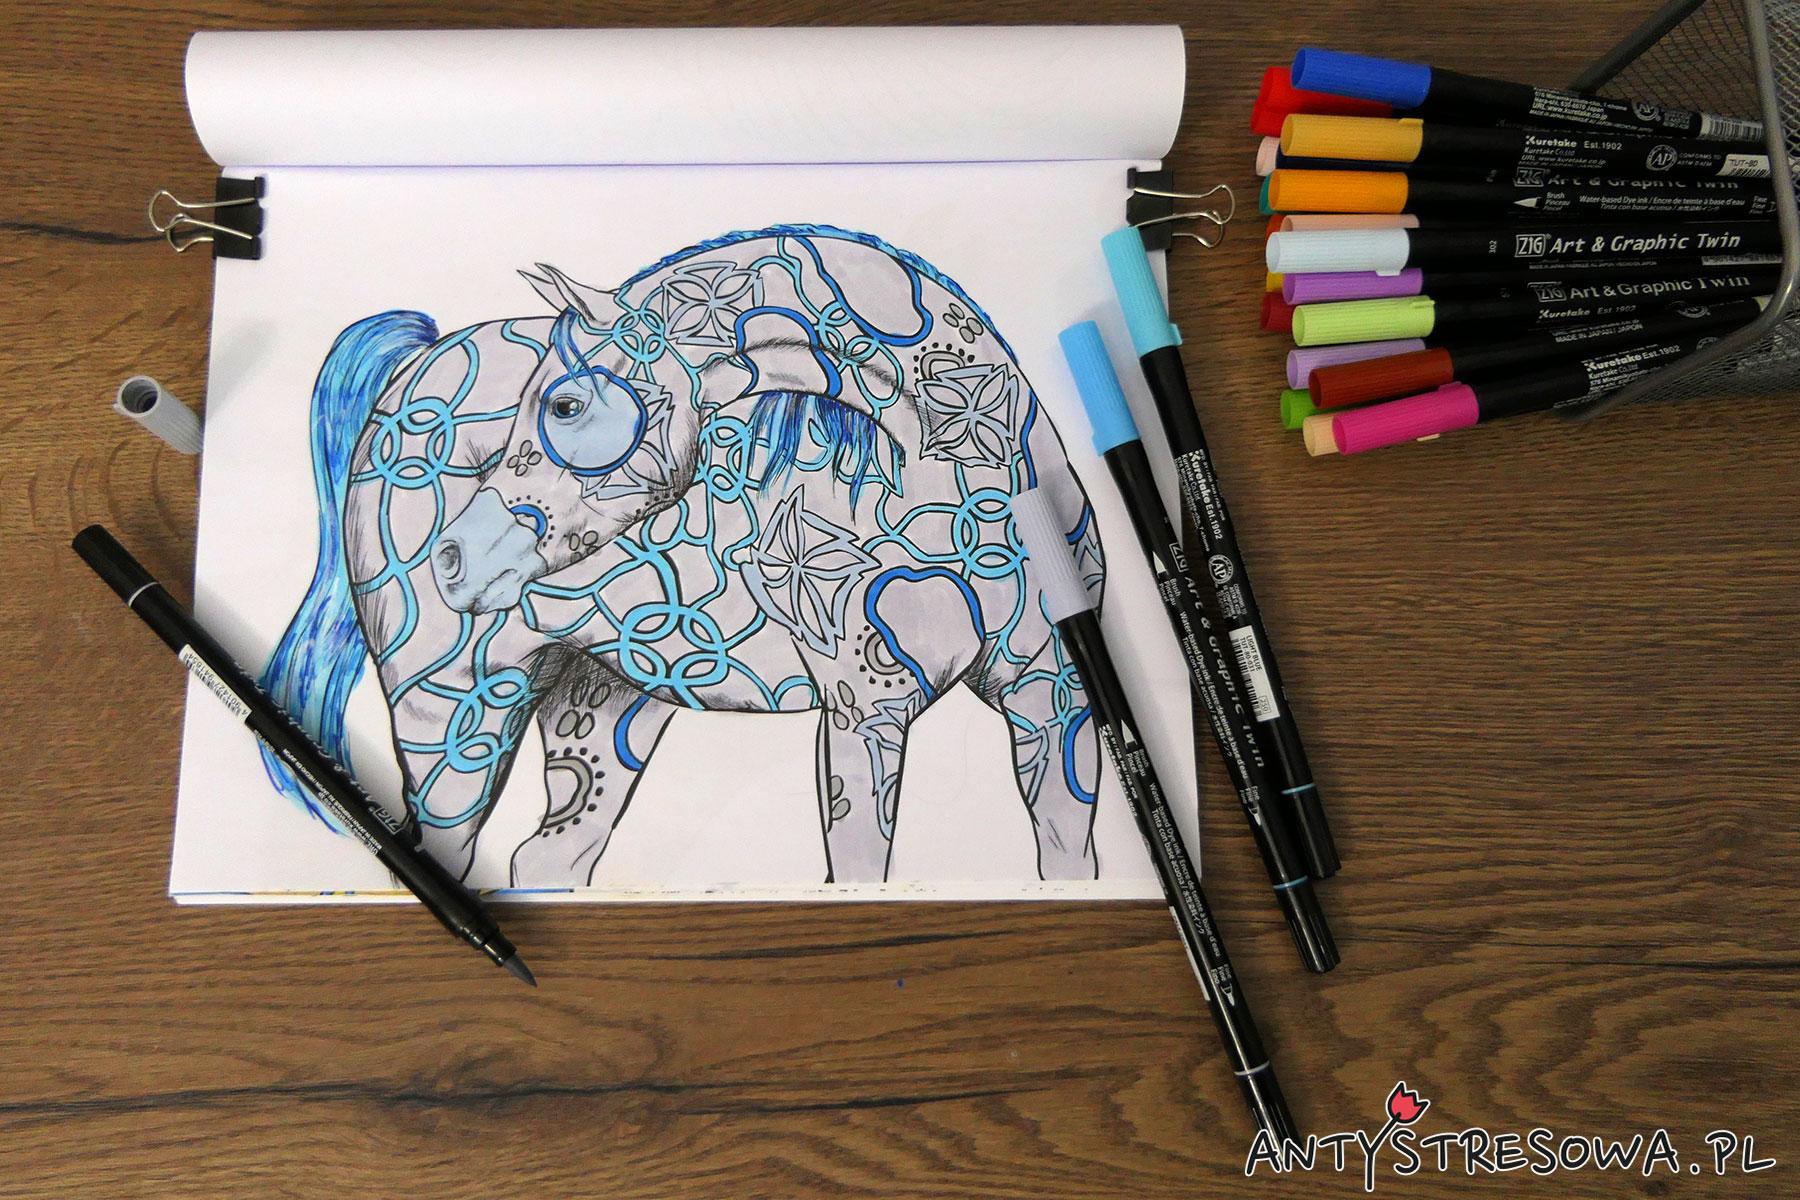 Amazing World of Horses, Cindy Elsharouni - niebieski koń